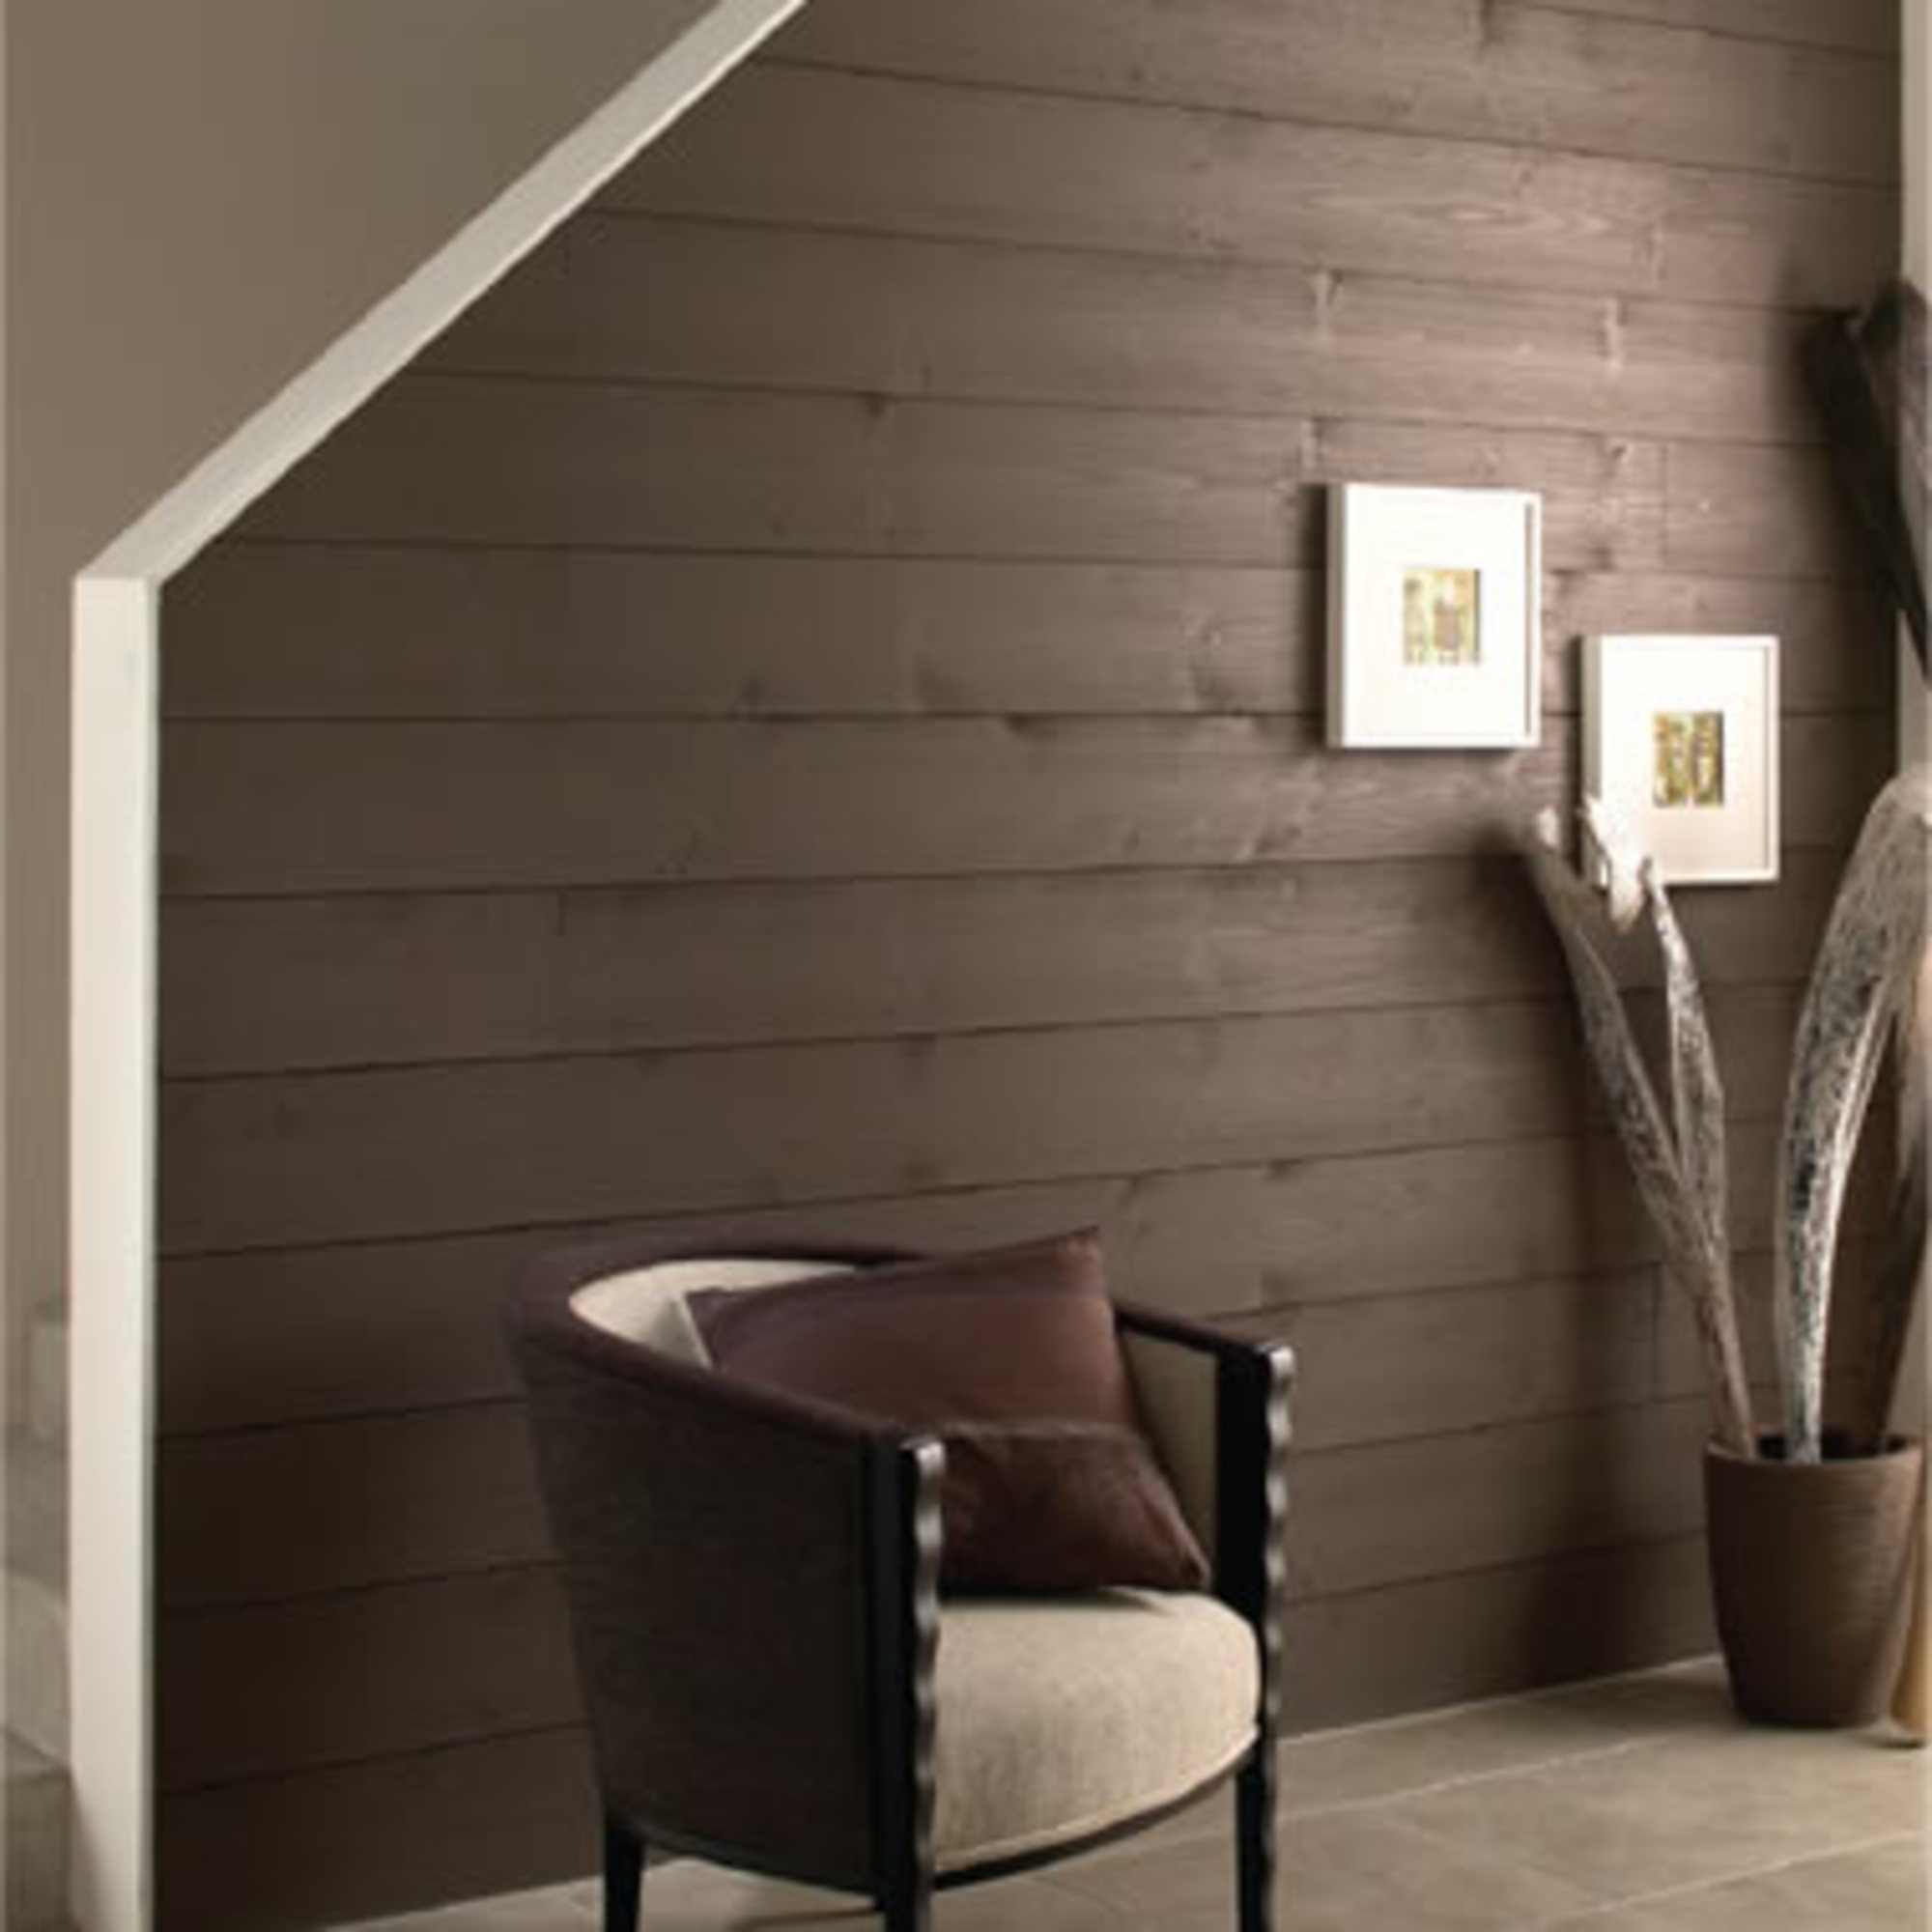 Neat pareti divisorie leroy merlin qm26 pineglen for Pareti divisorie in legno leroy merlin